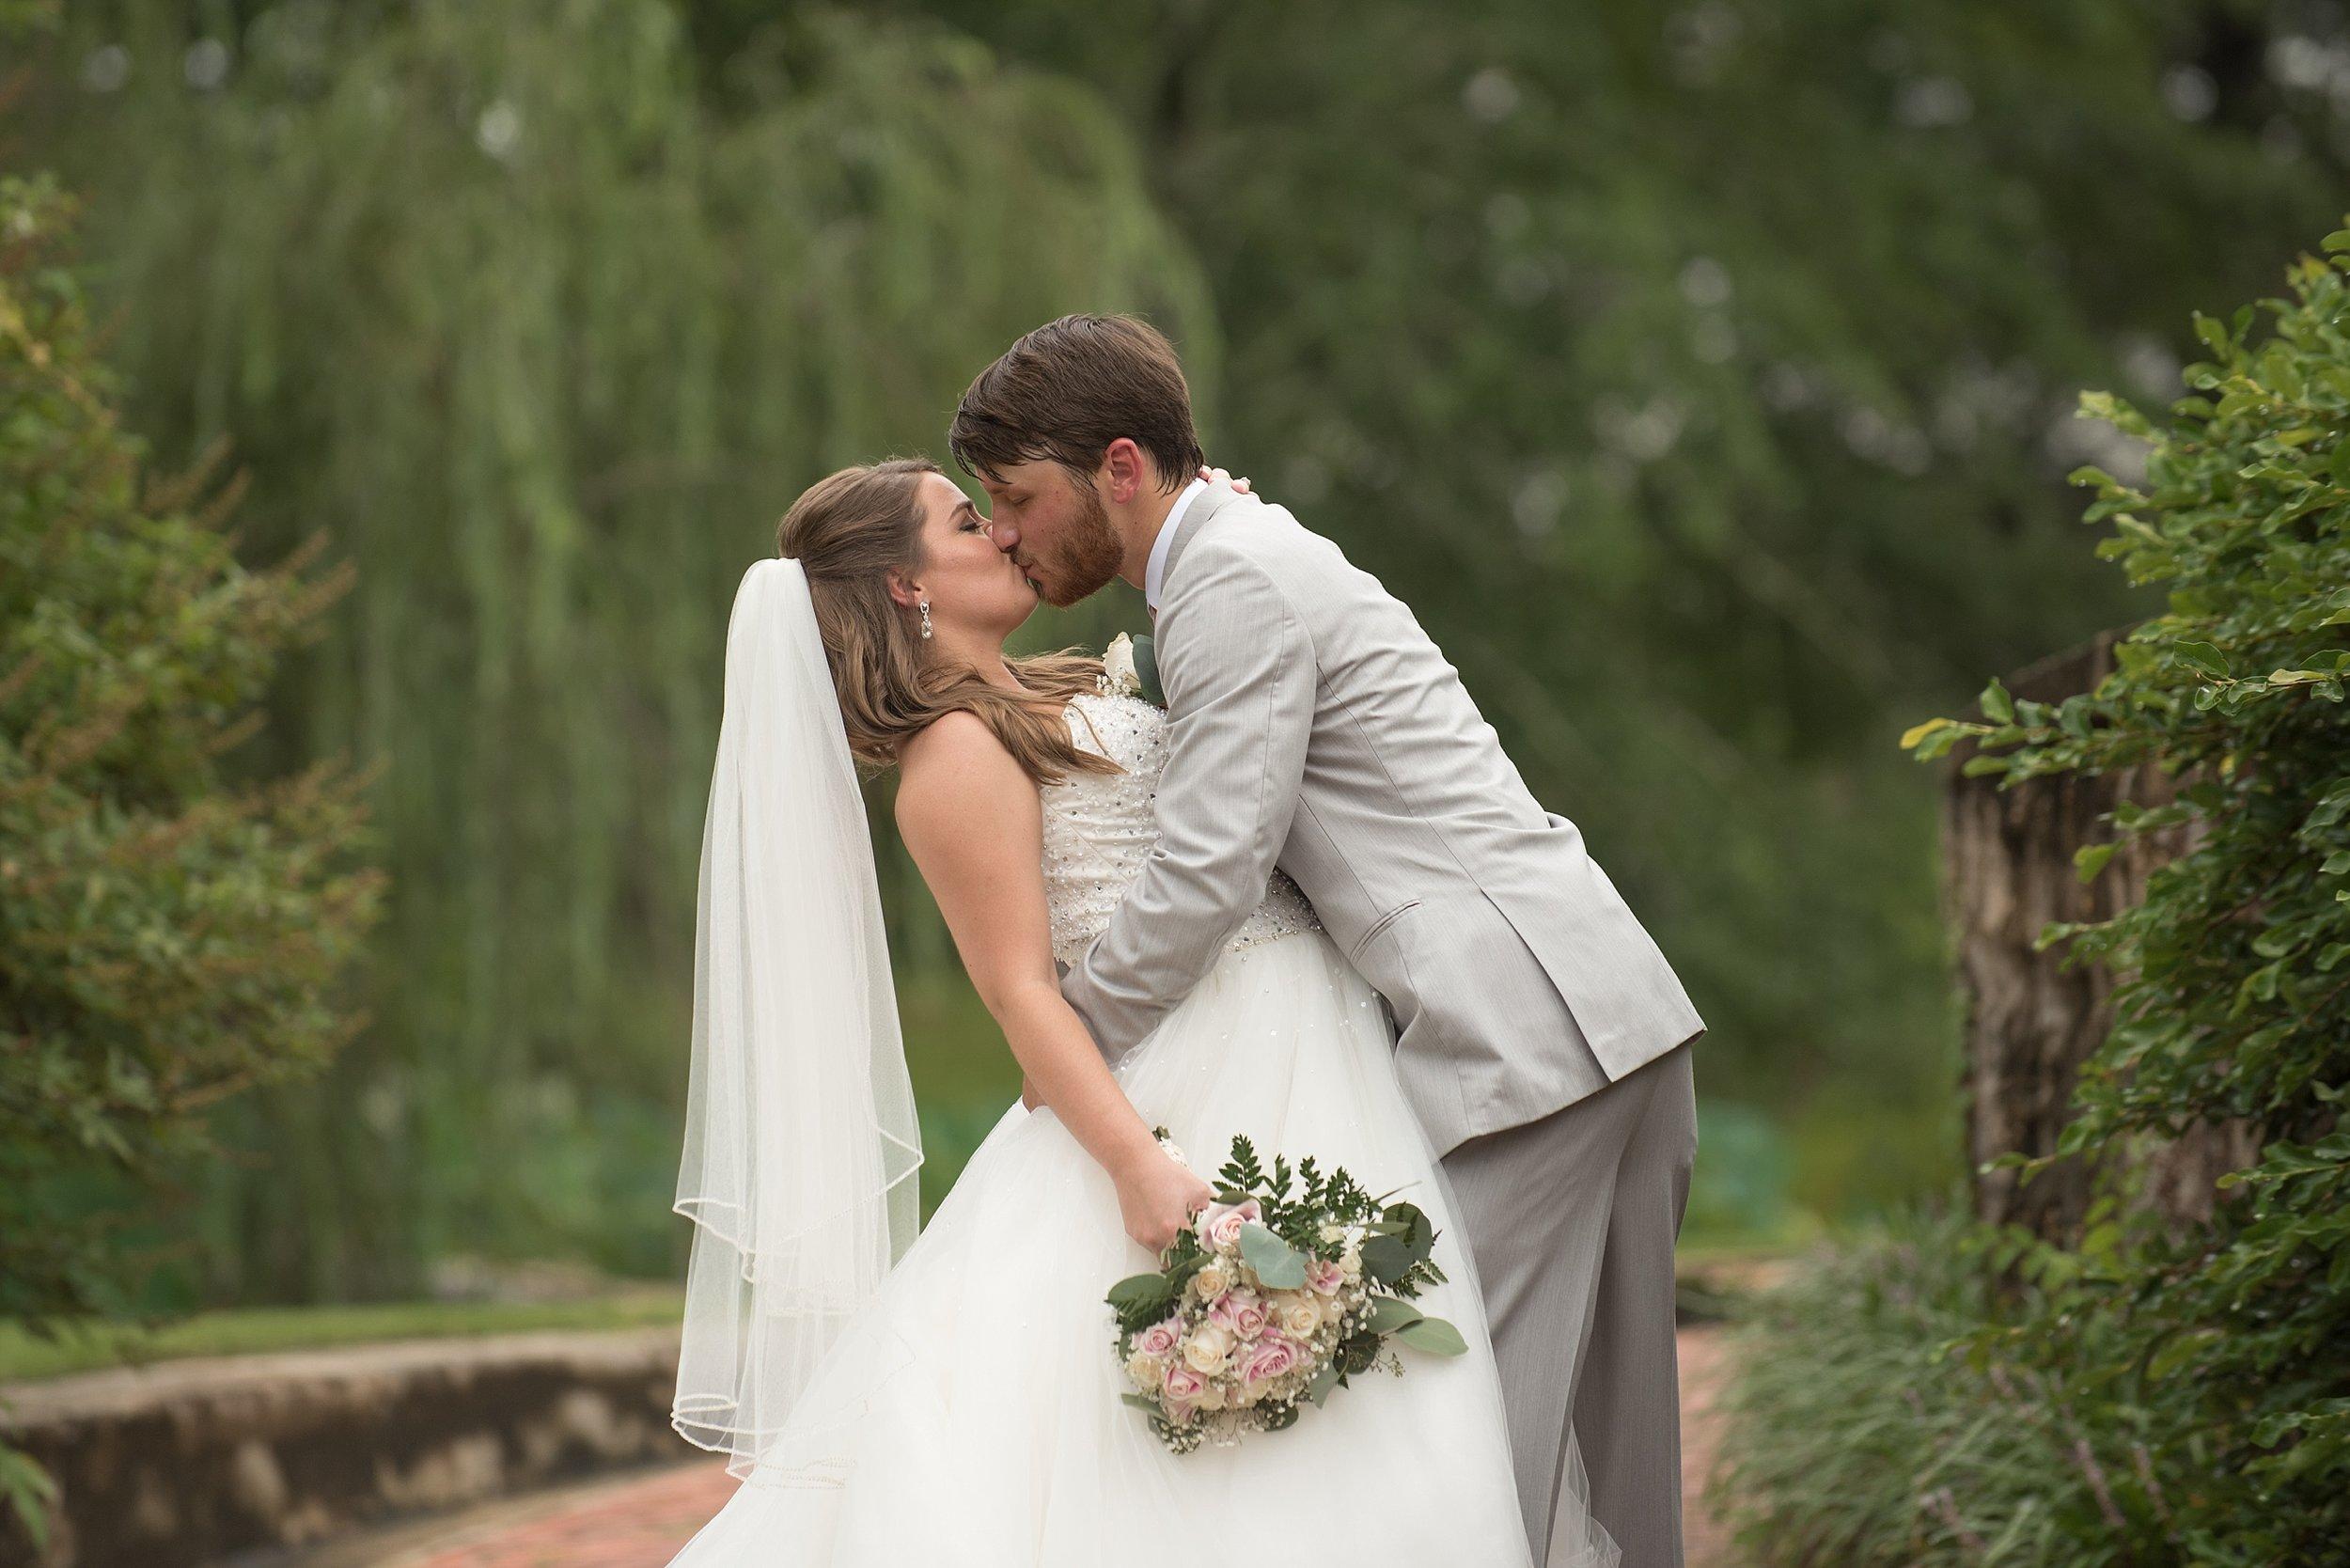 Groom kisses his beautiful bride in a white ballgown wedding dress